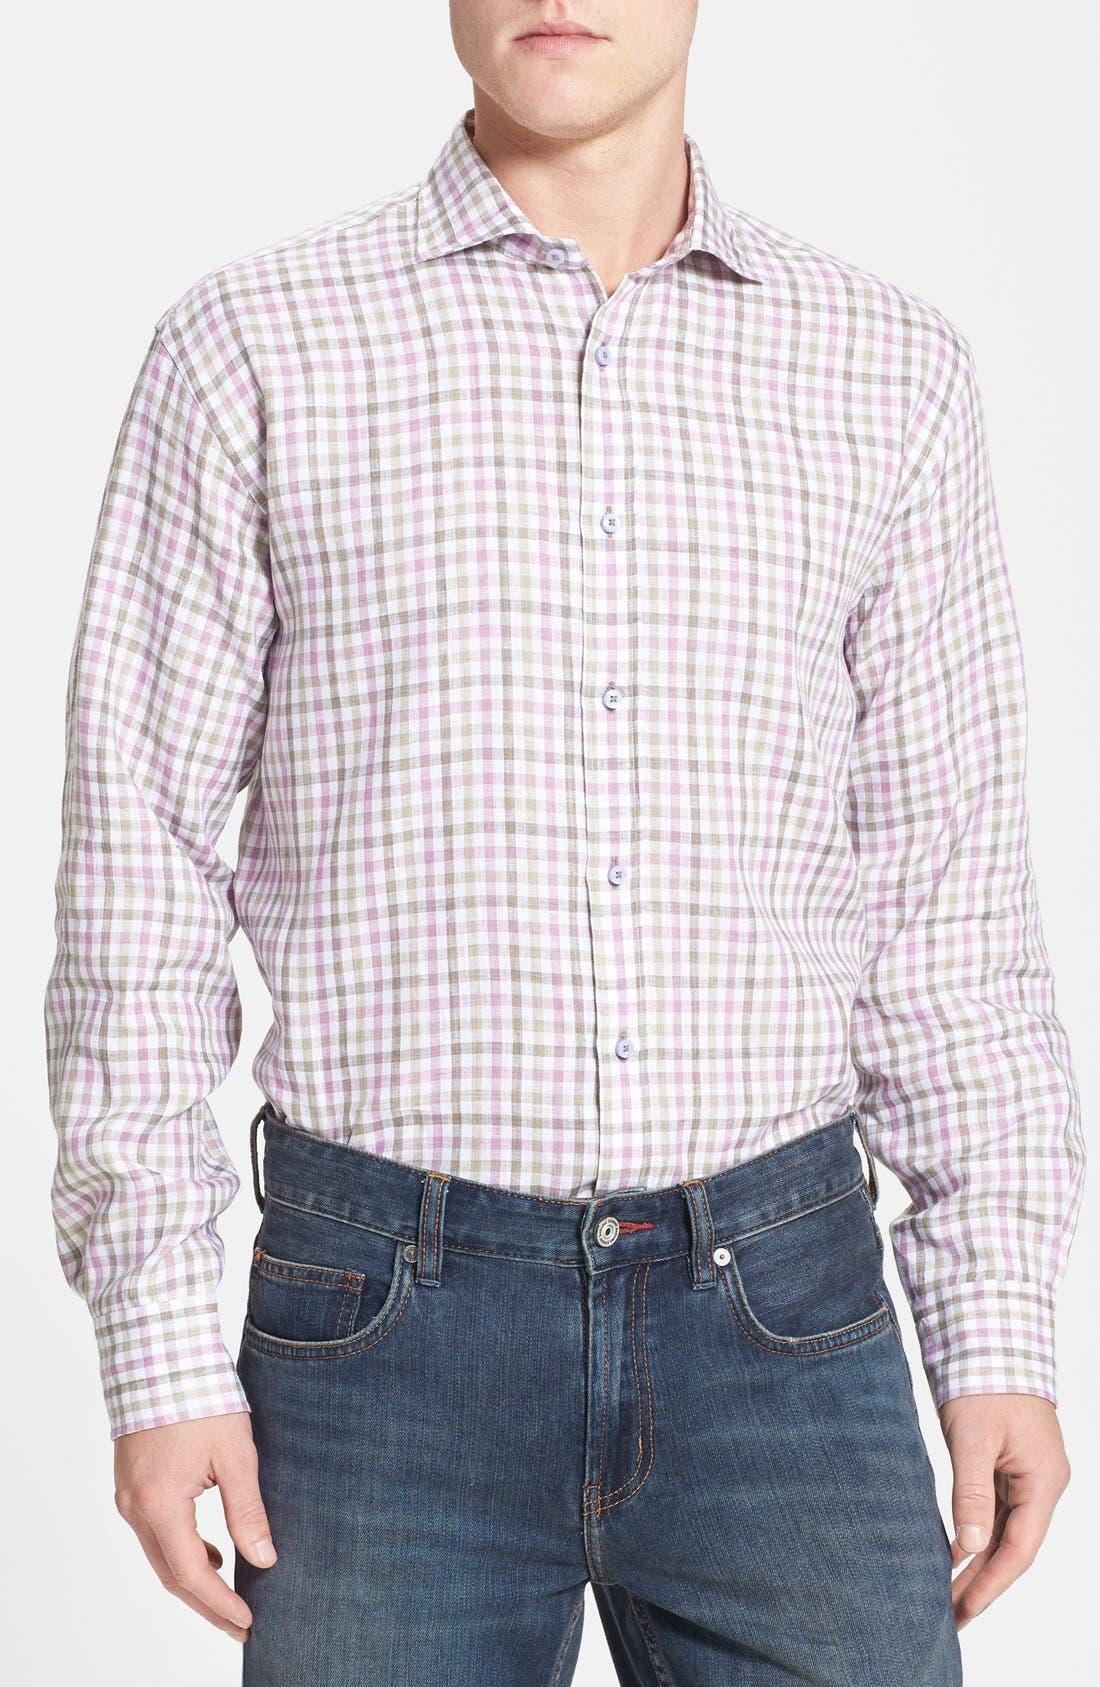 Alternate Image 1 Selected - Thomas Dean Regular Fit Linen Sport Shirt